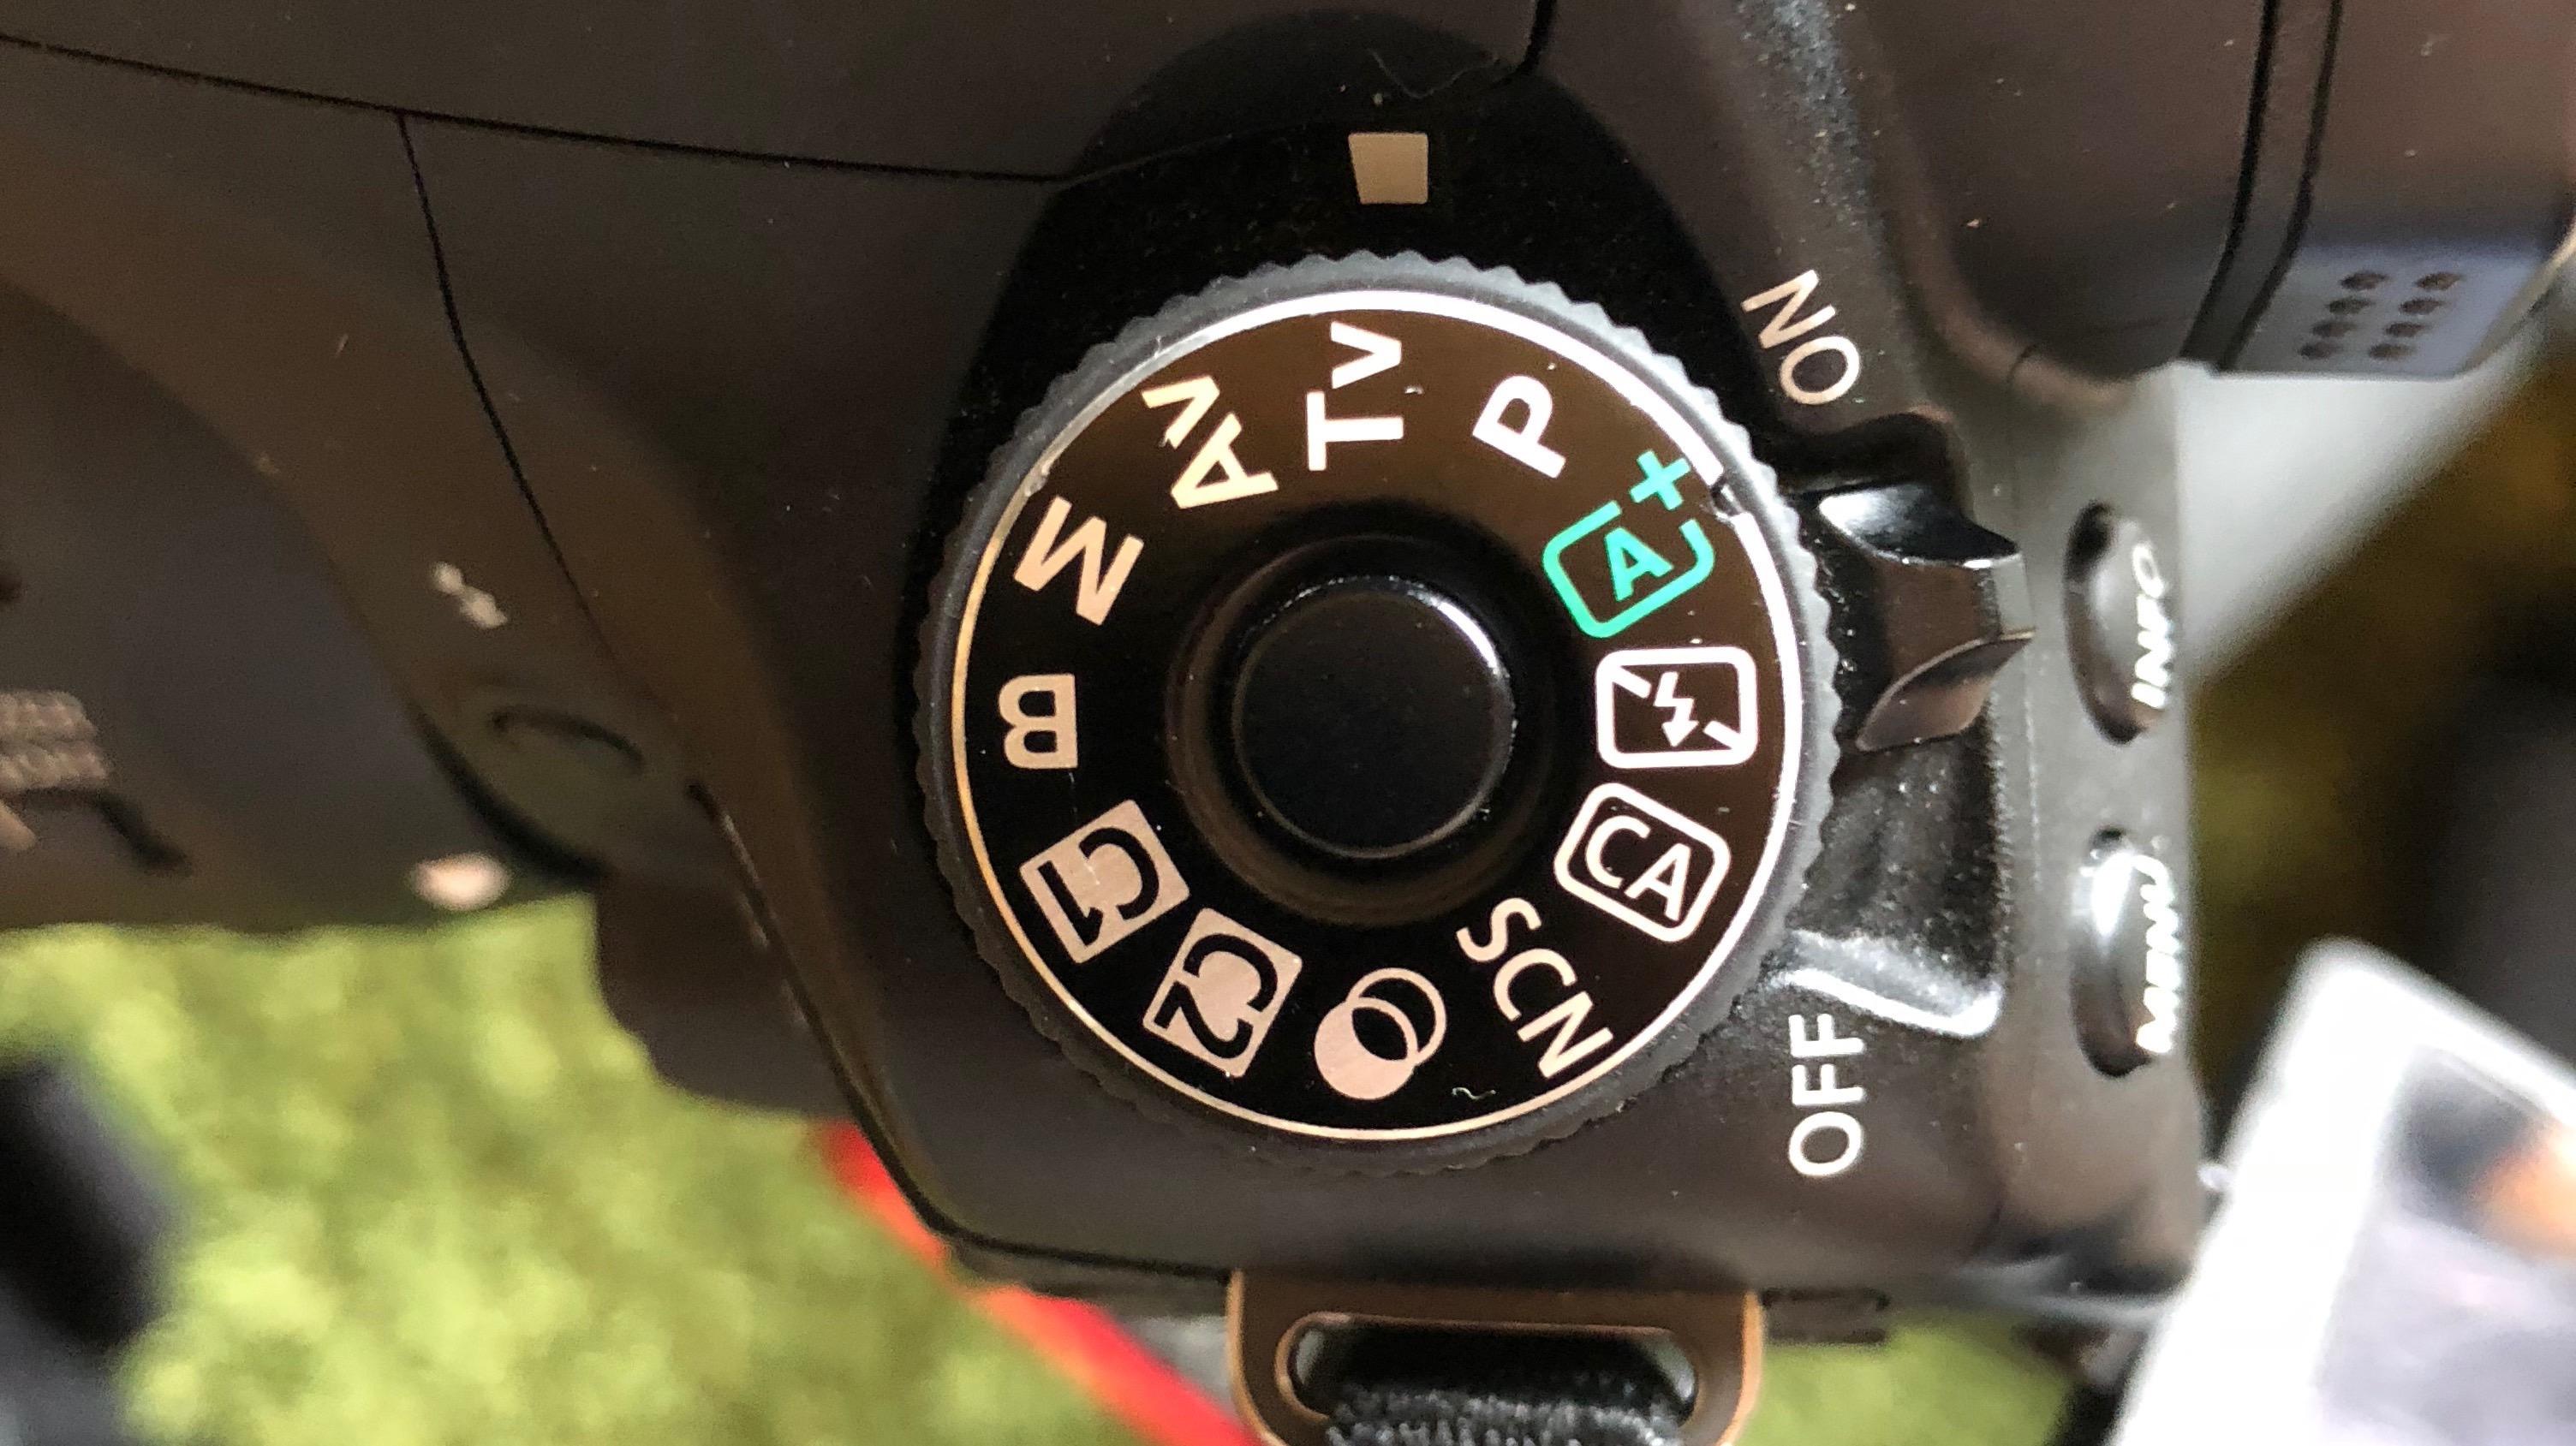 Canon EOS 80D 実写レビュー 初めての一眼レフ   episode 1    Tvモード